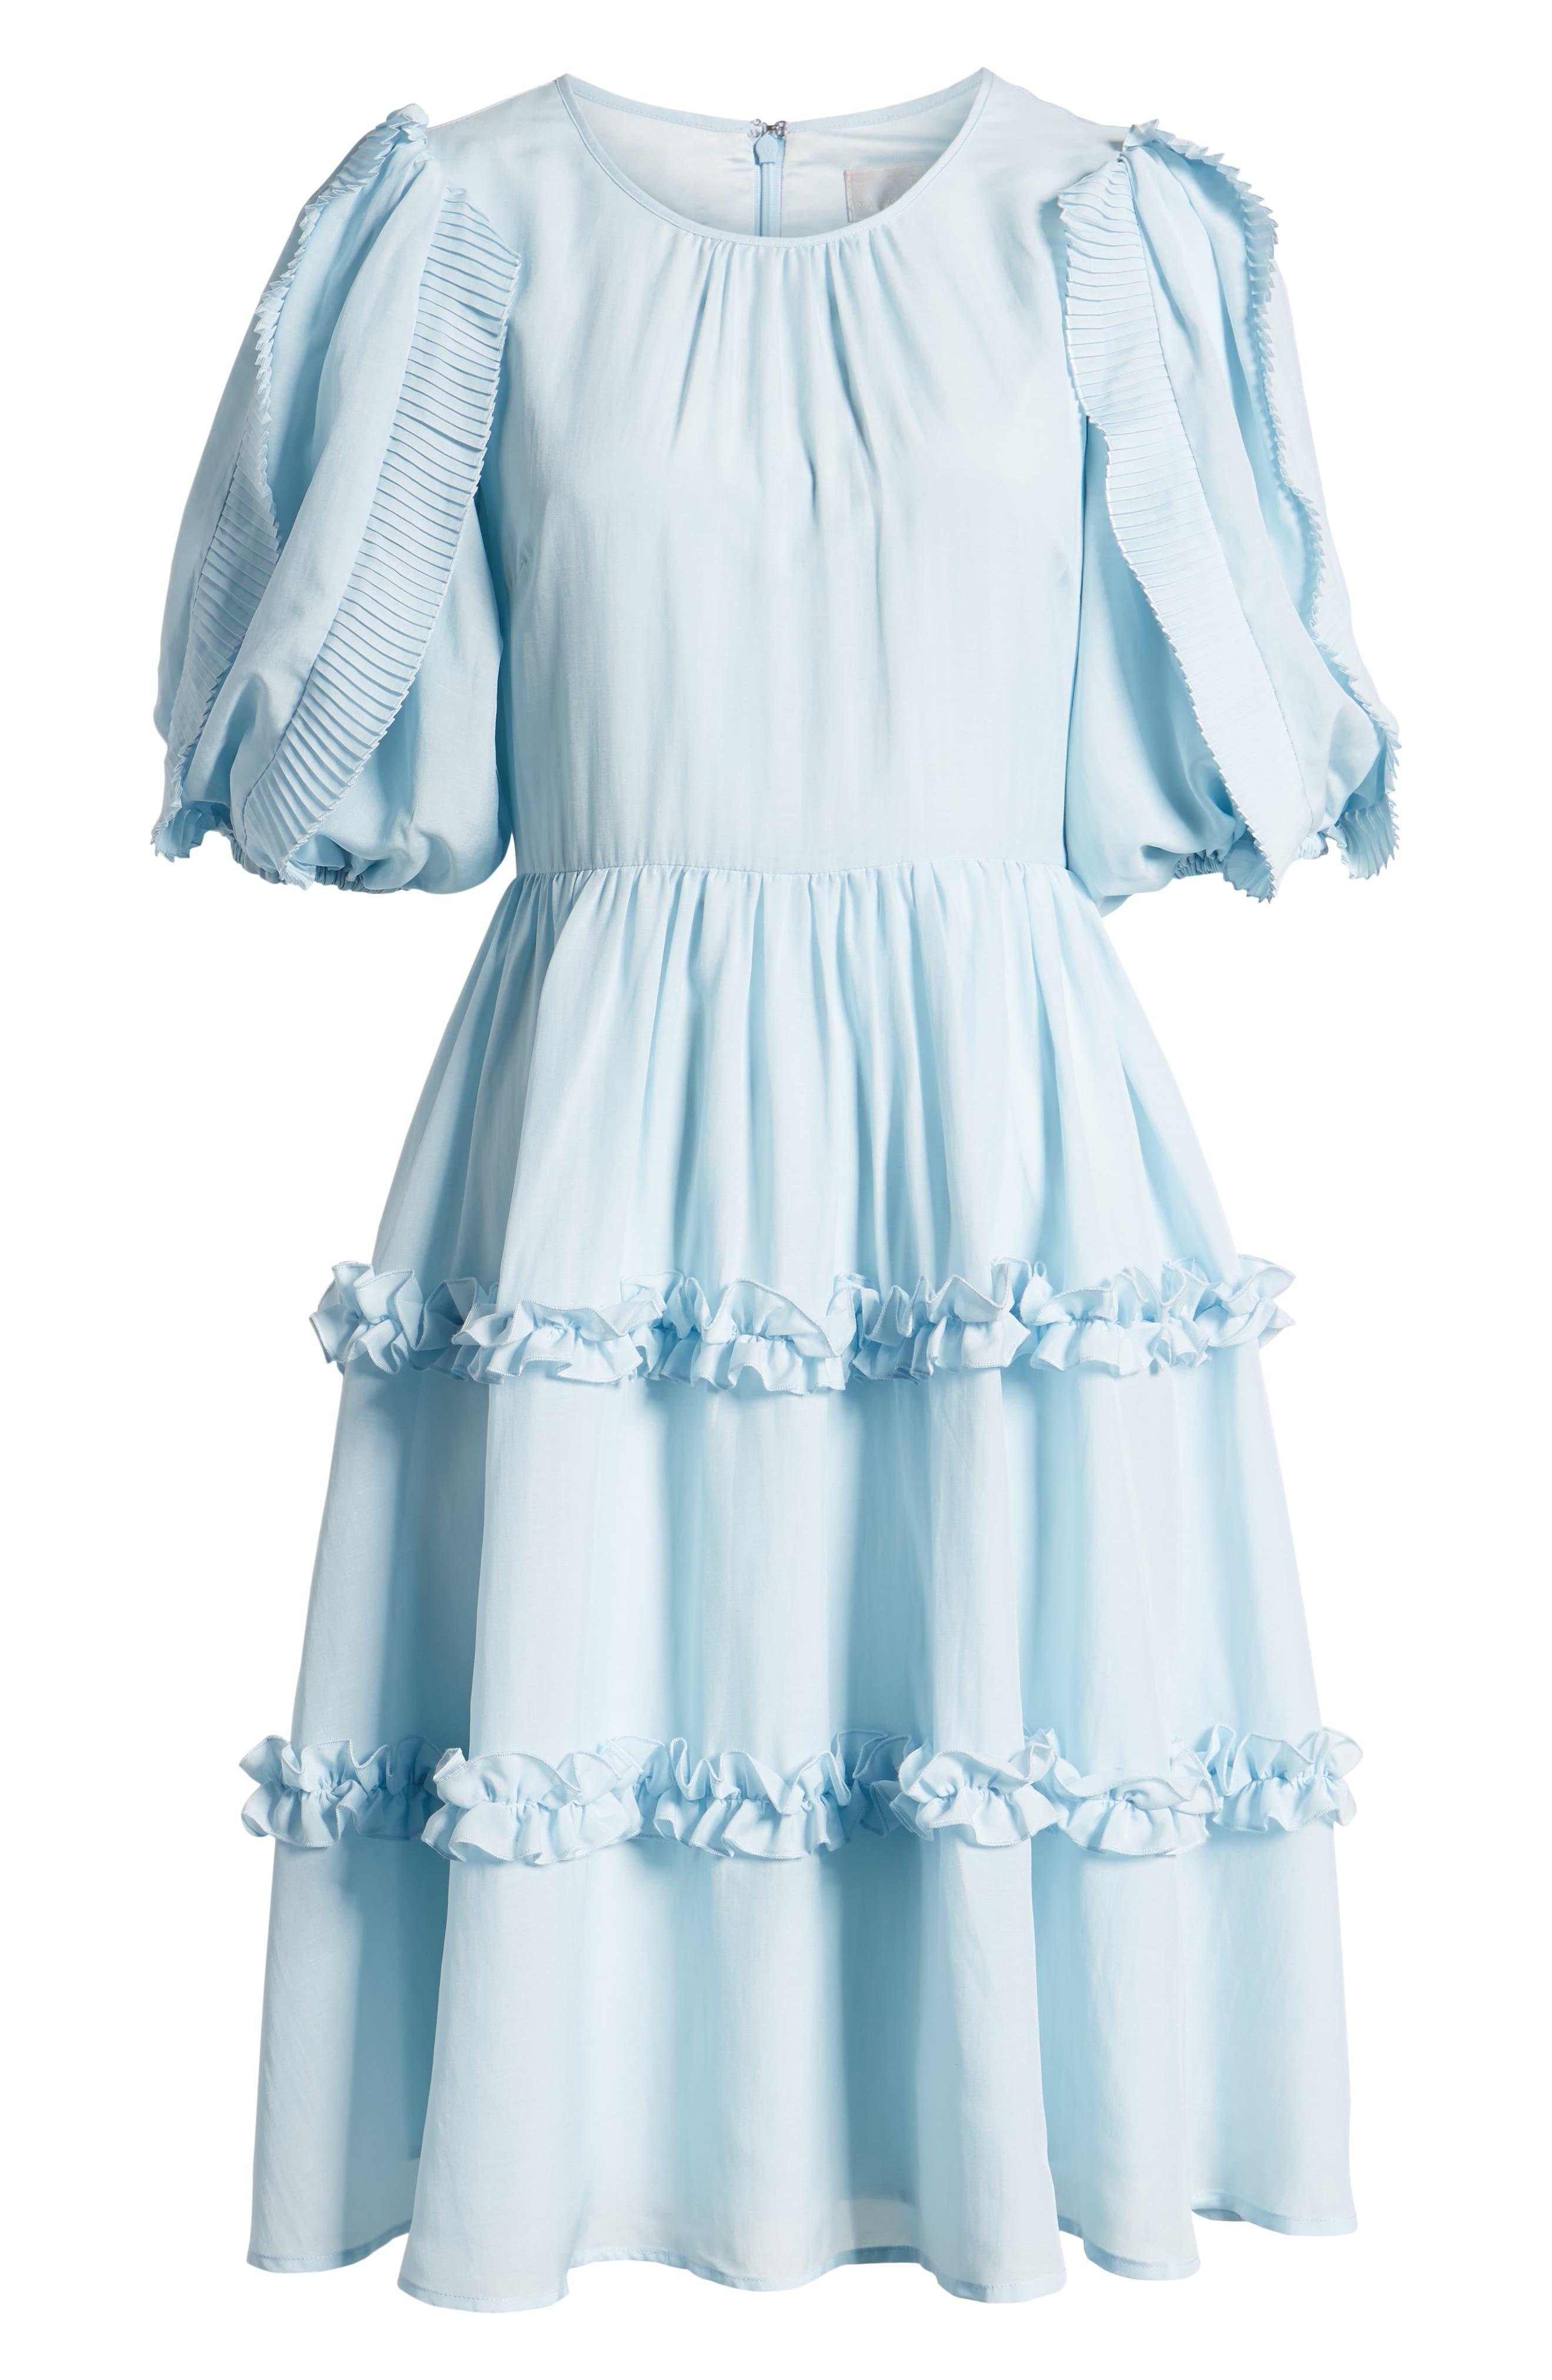 RACHEL PARCELL, Ruffle Sleeve Dress, Alternate thumbnail 7, color, BLUE WINTER